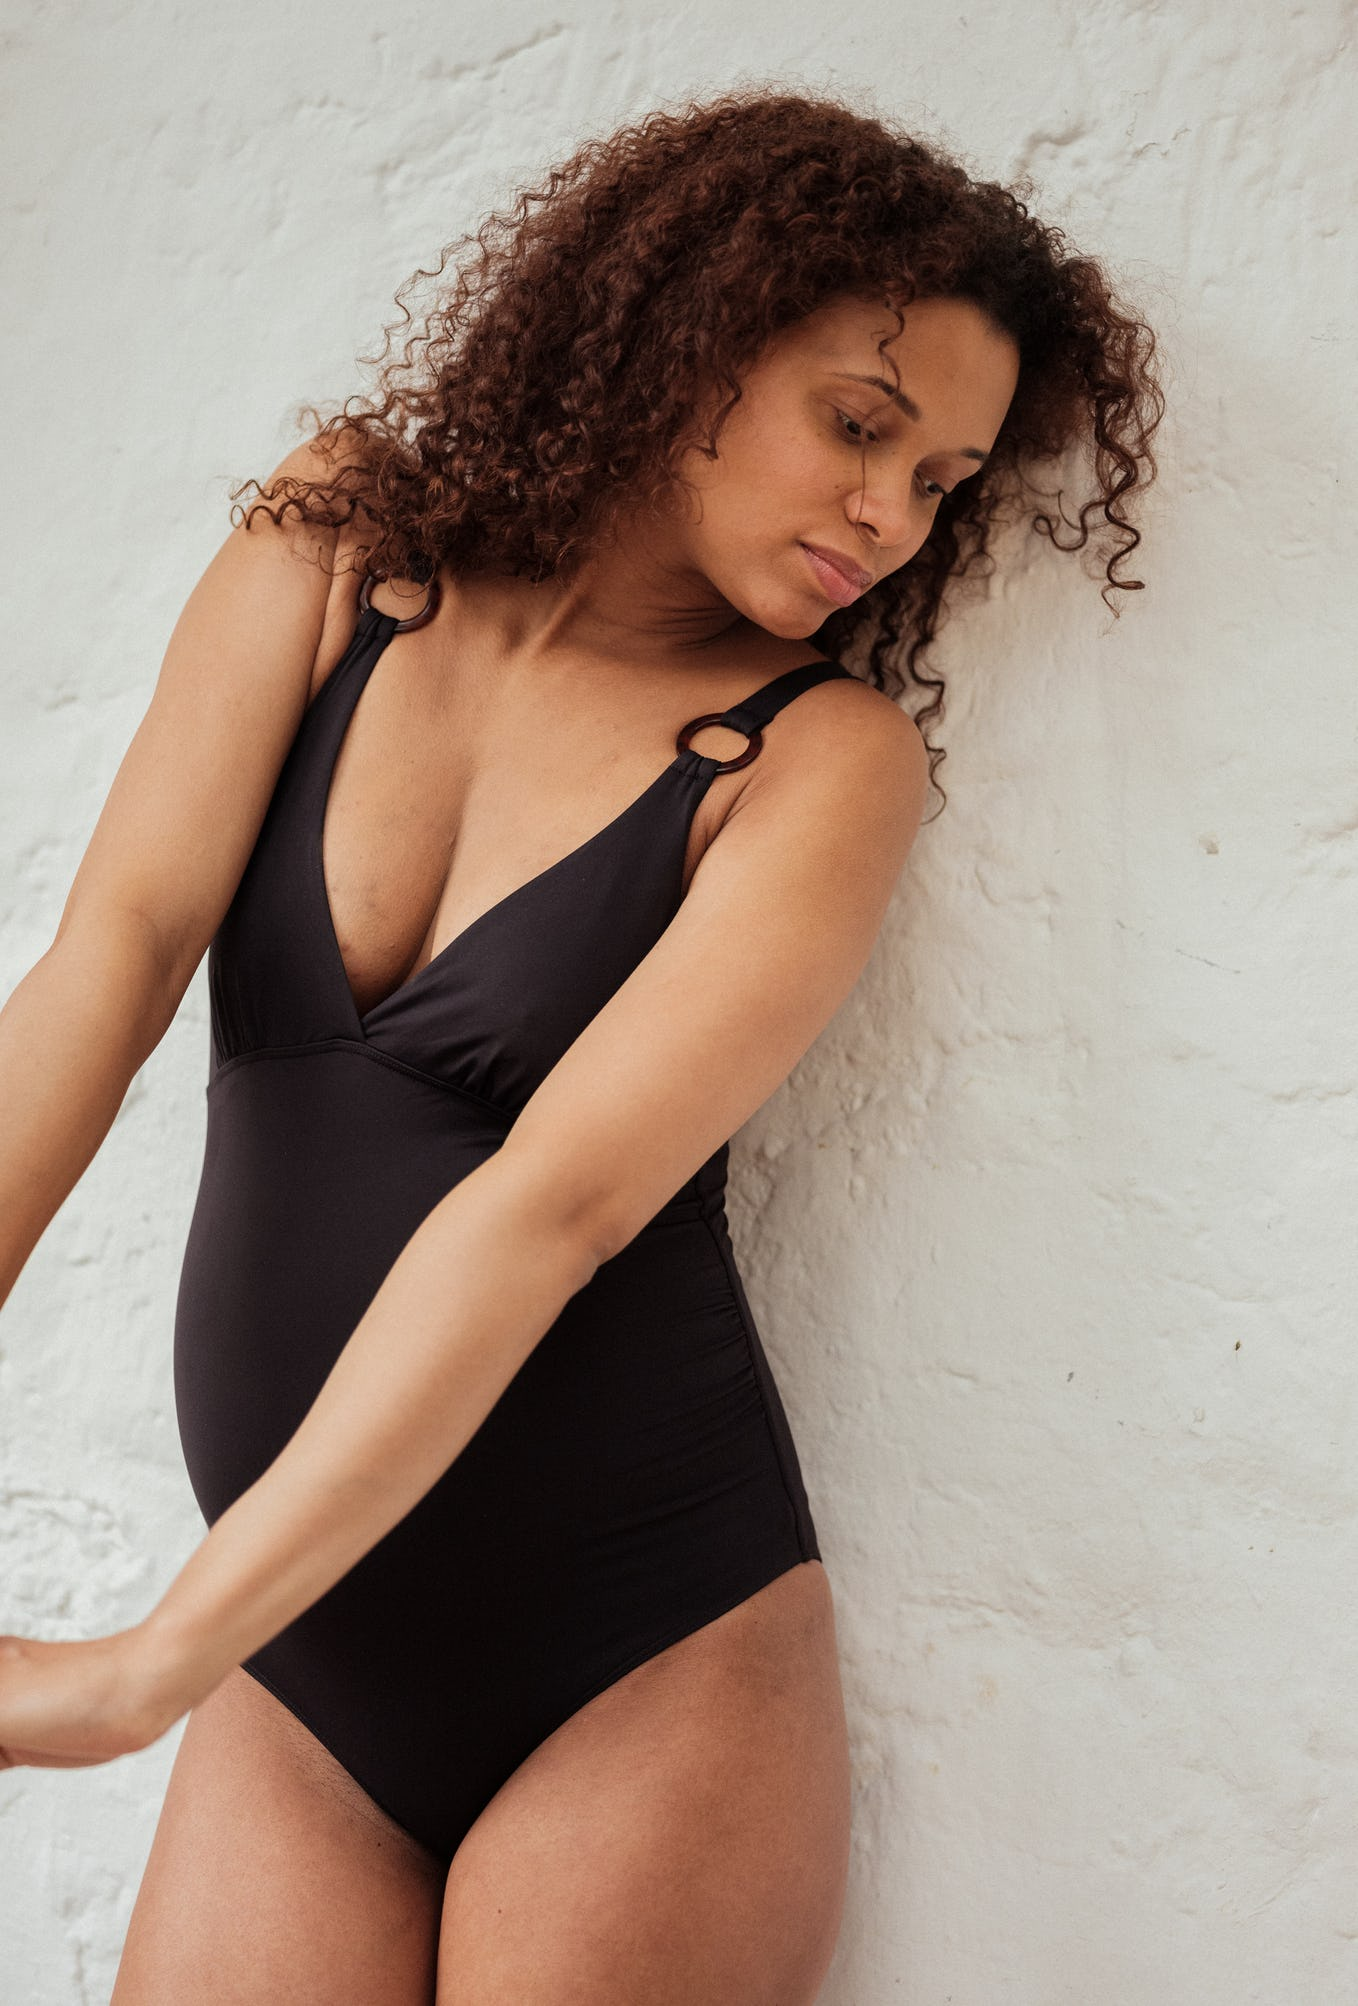 Swimsuit Une chanson douce in black